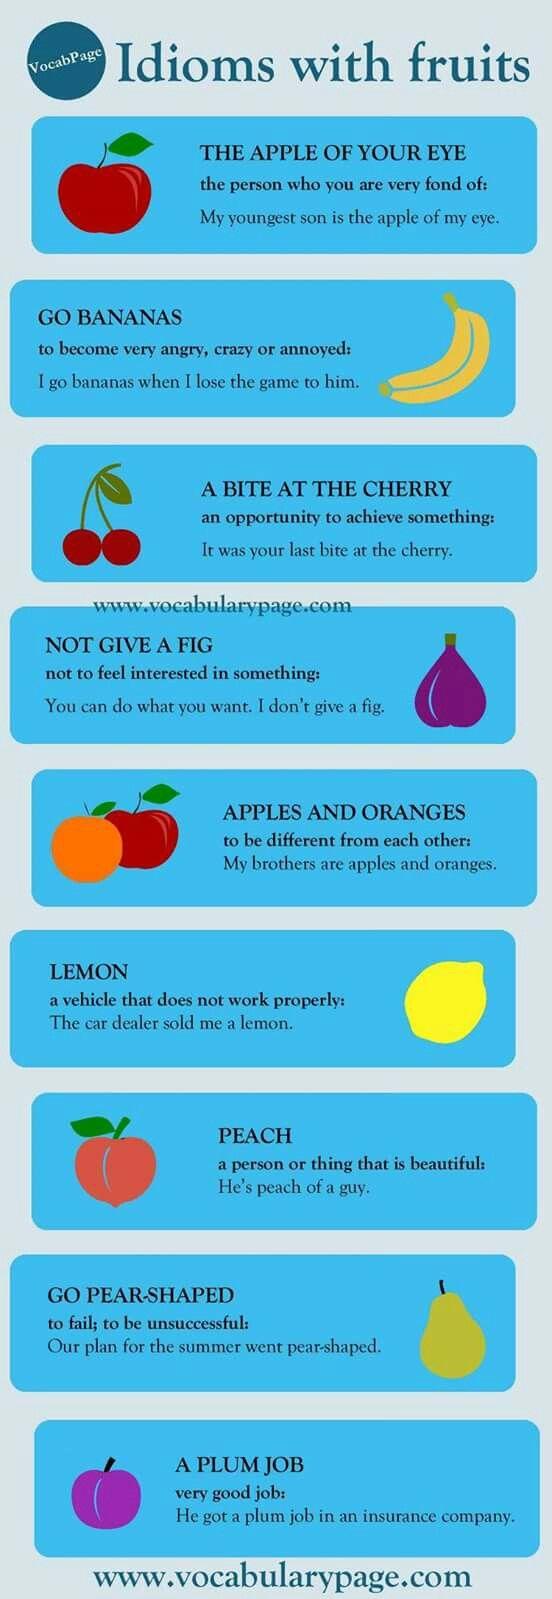 #Idioms_Time #Fruit_Idioms